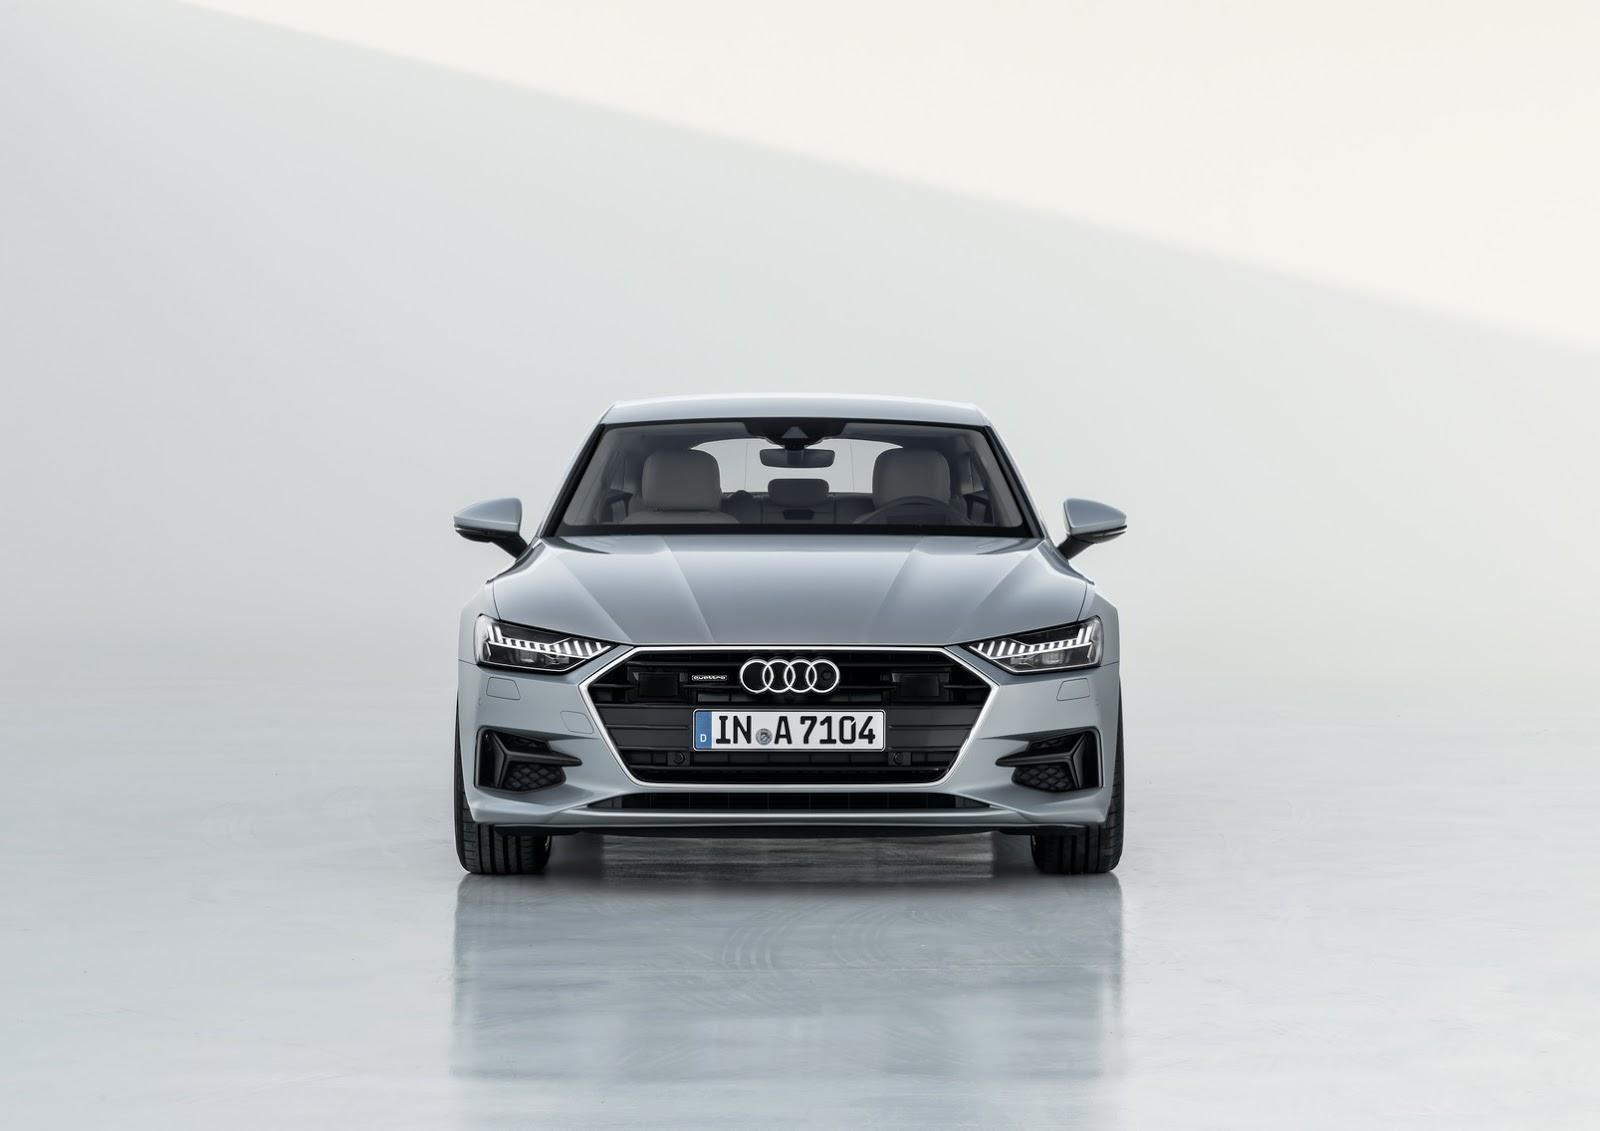 2018_Audi_A7_Sportback_0002